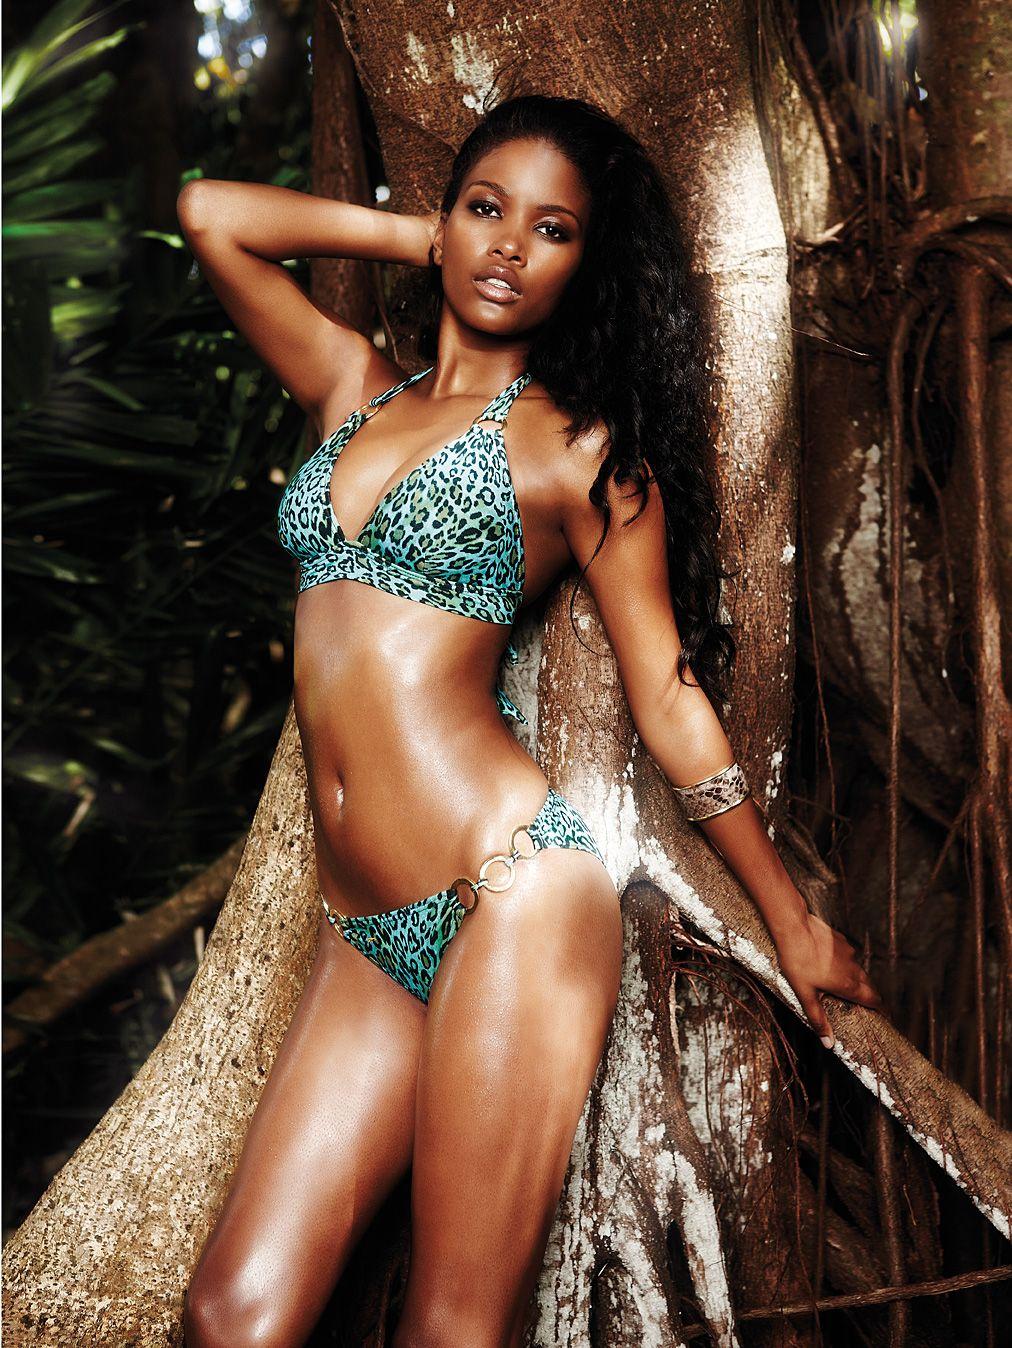 afreca-jungals-sexy-wamens-pics-wwe-kaitlyn-sex-nude-photos